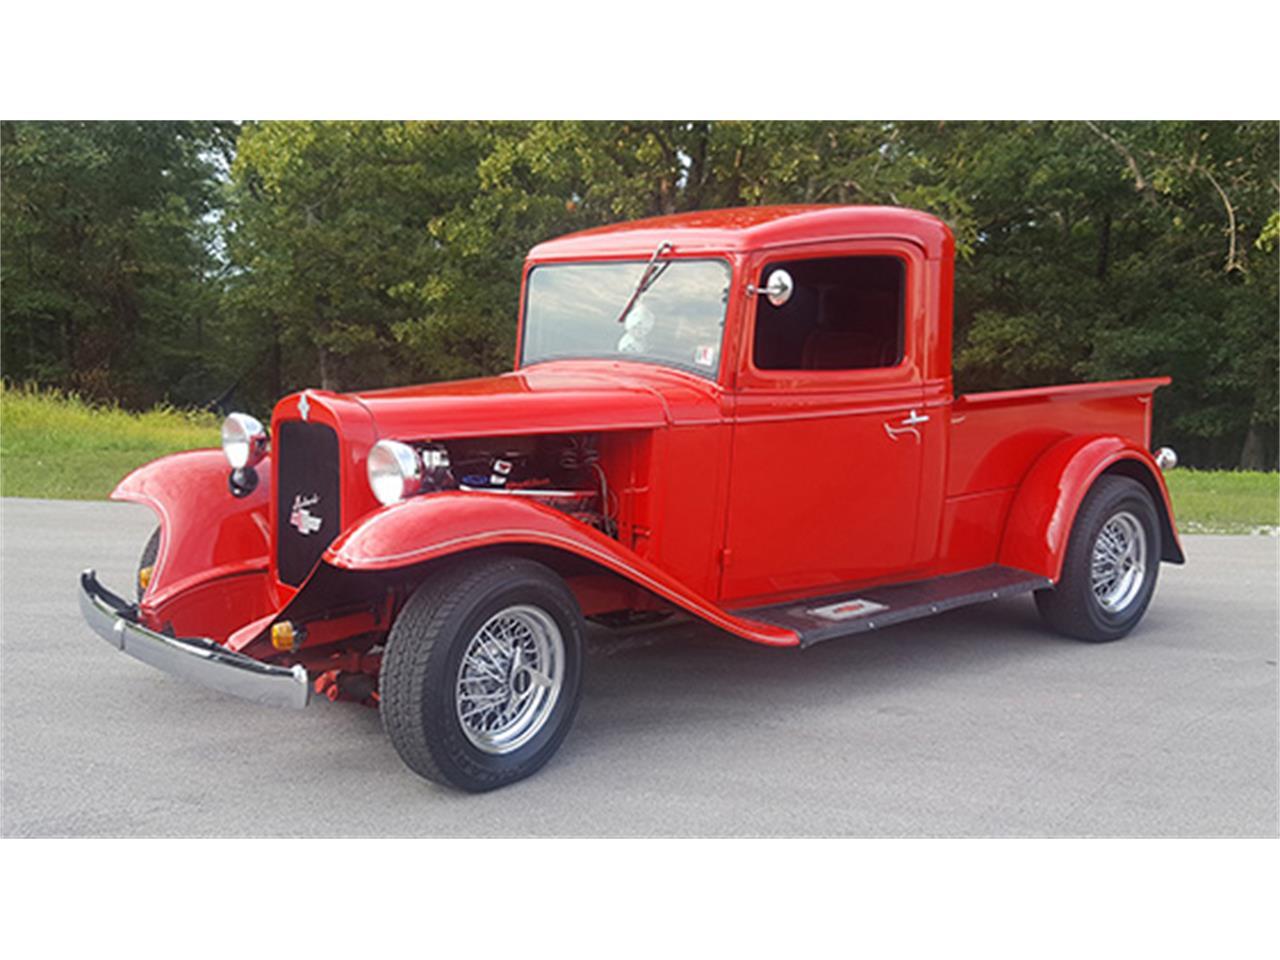 Chevy Dealers Phoenix >> 1932 Chevrolet Hot Rod Pickup for Sale | ClassicCars.com | CC-1015433